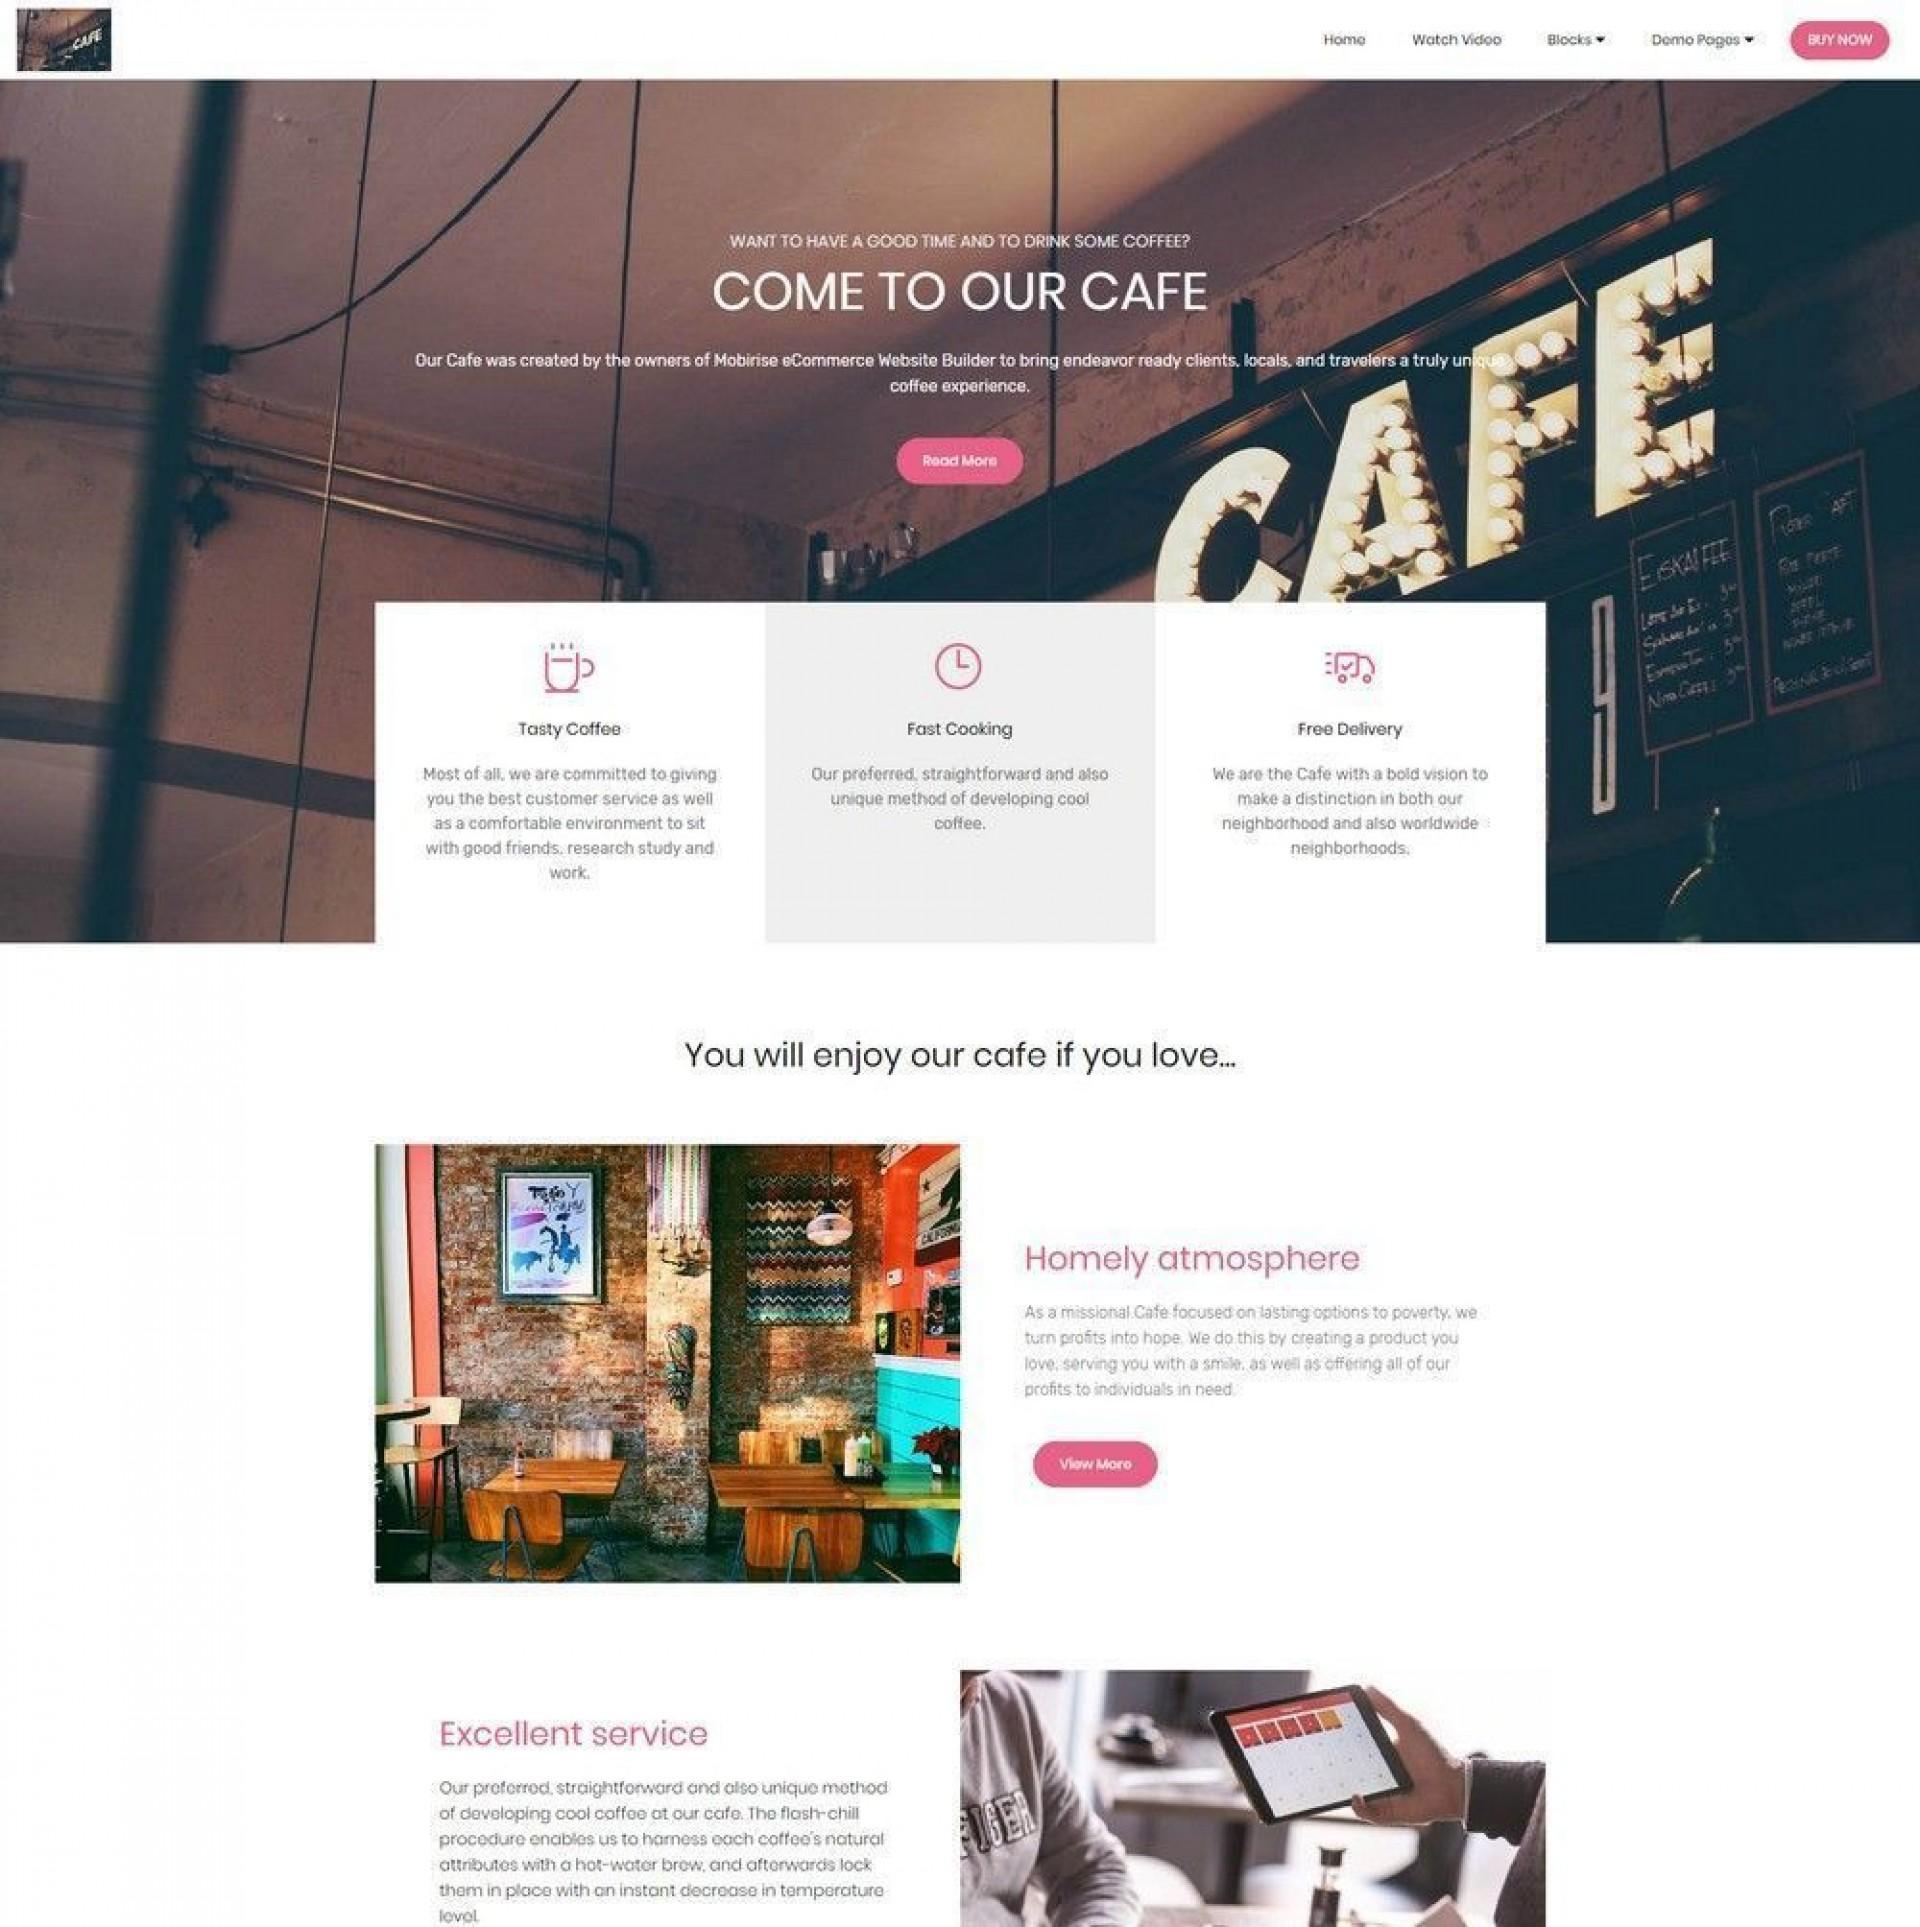 000 Impressive Website Design Template Free High Resolution  Asp.net Web Download Psd1920